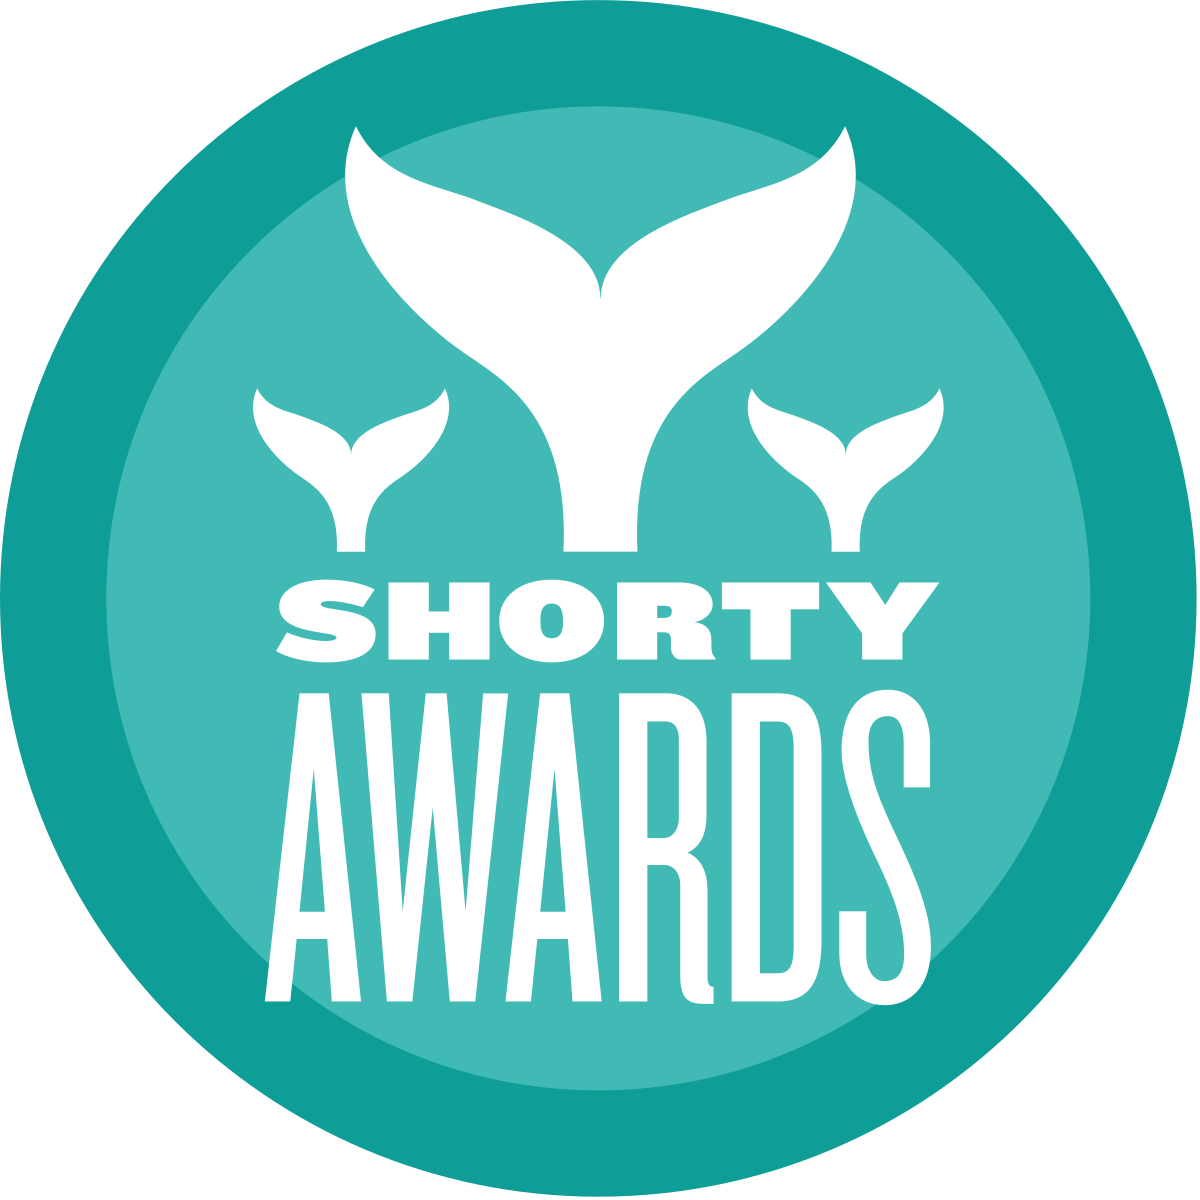 Shorty Award Logo